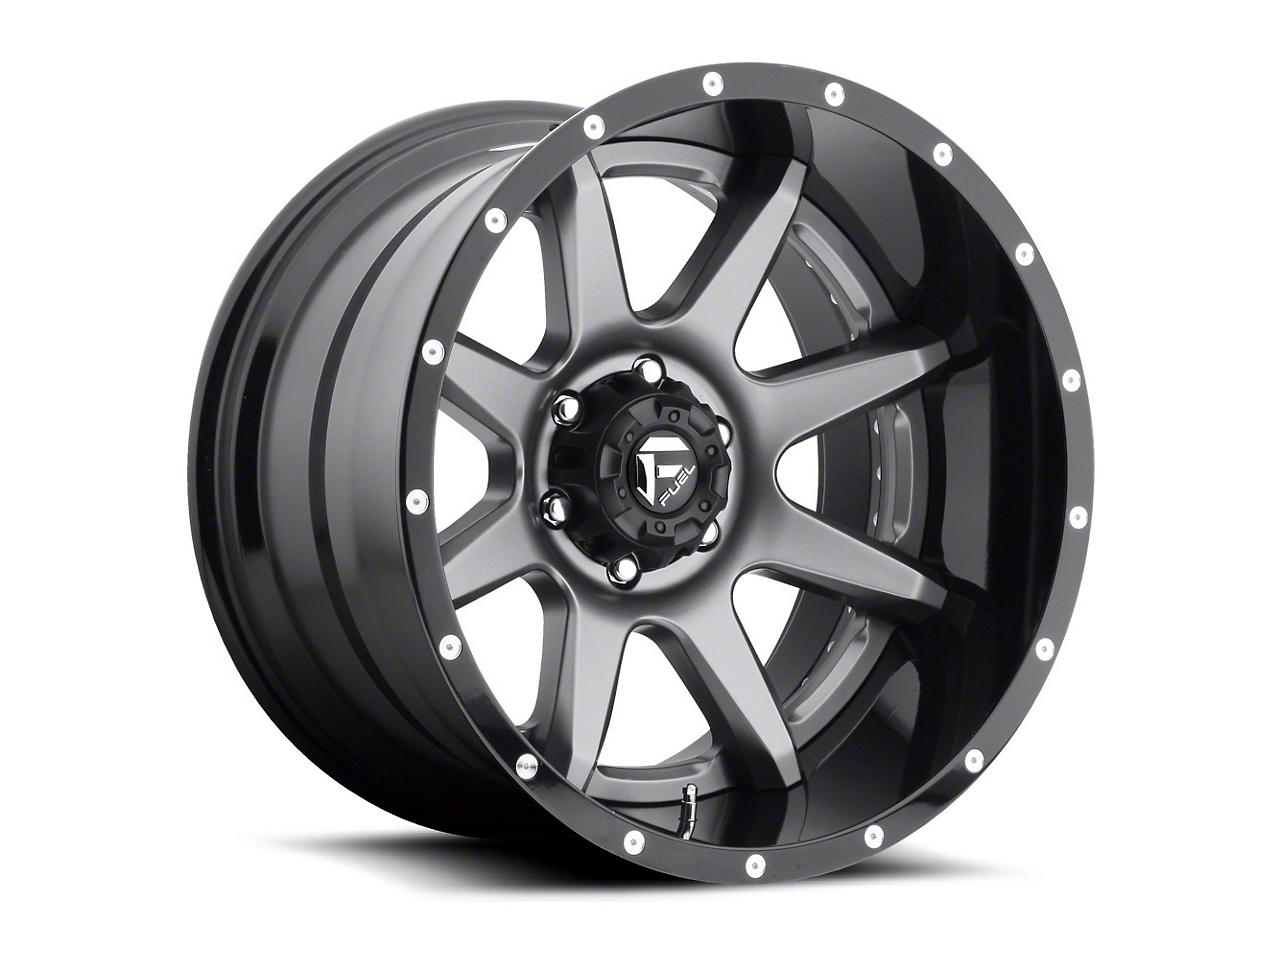 Fuel Wheels Rampage Gun Metal 5-Lug Wheel - 22x12 (02-18 RAM 1500, Excluding Mega Cab)